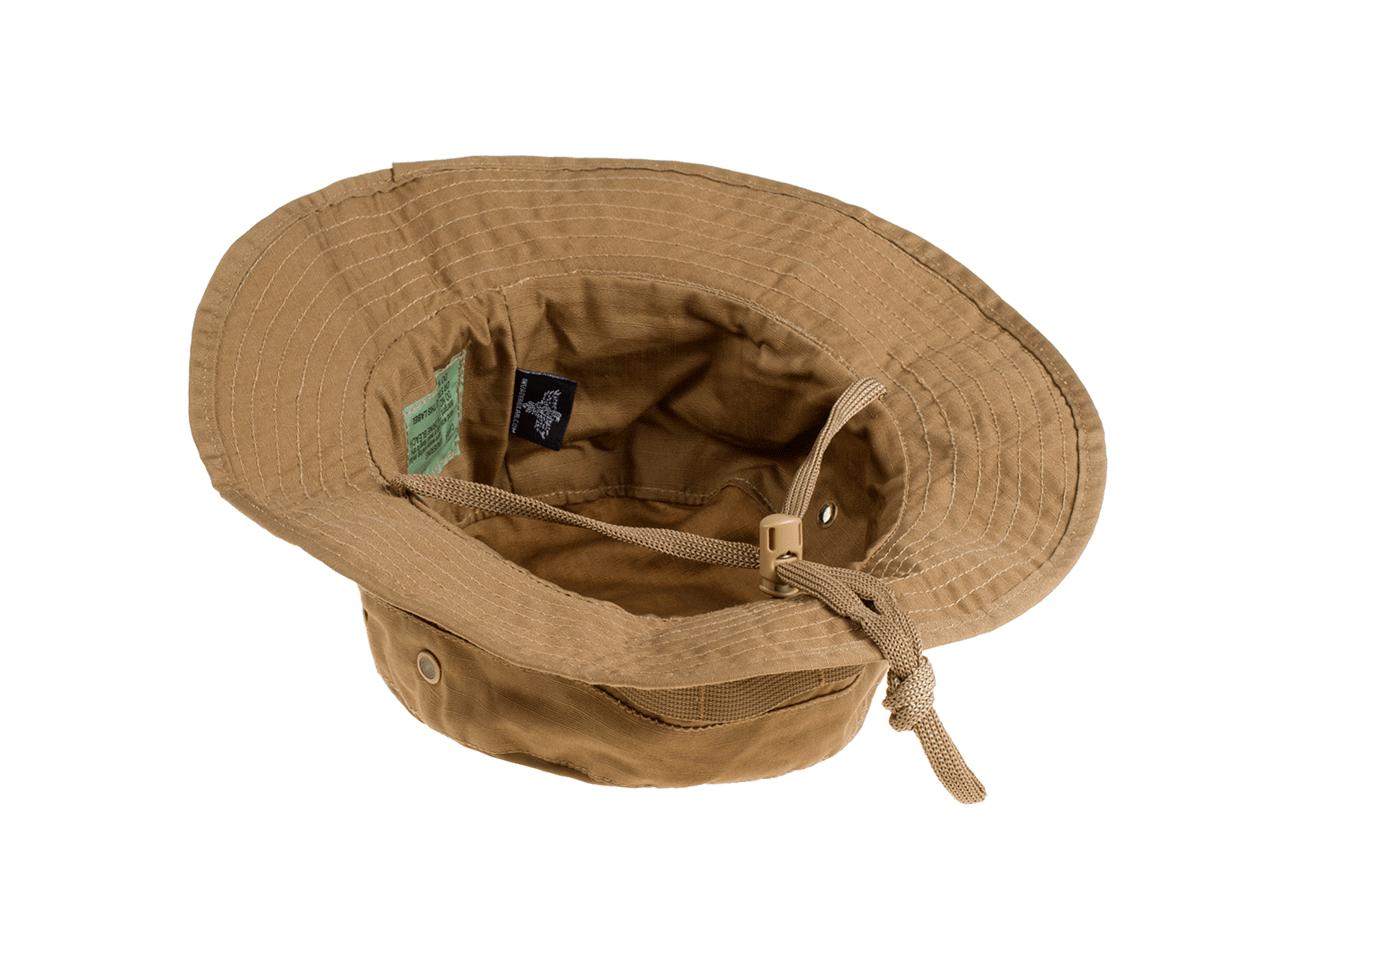 0887246cdfa Boonie Hat Coyote 59   L - Boonies - Headwear - Garments - invadergear.ch  Online shop